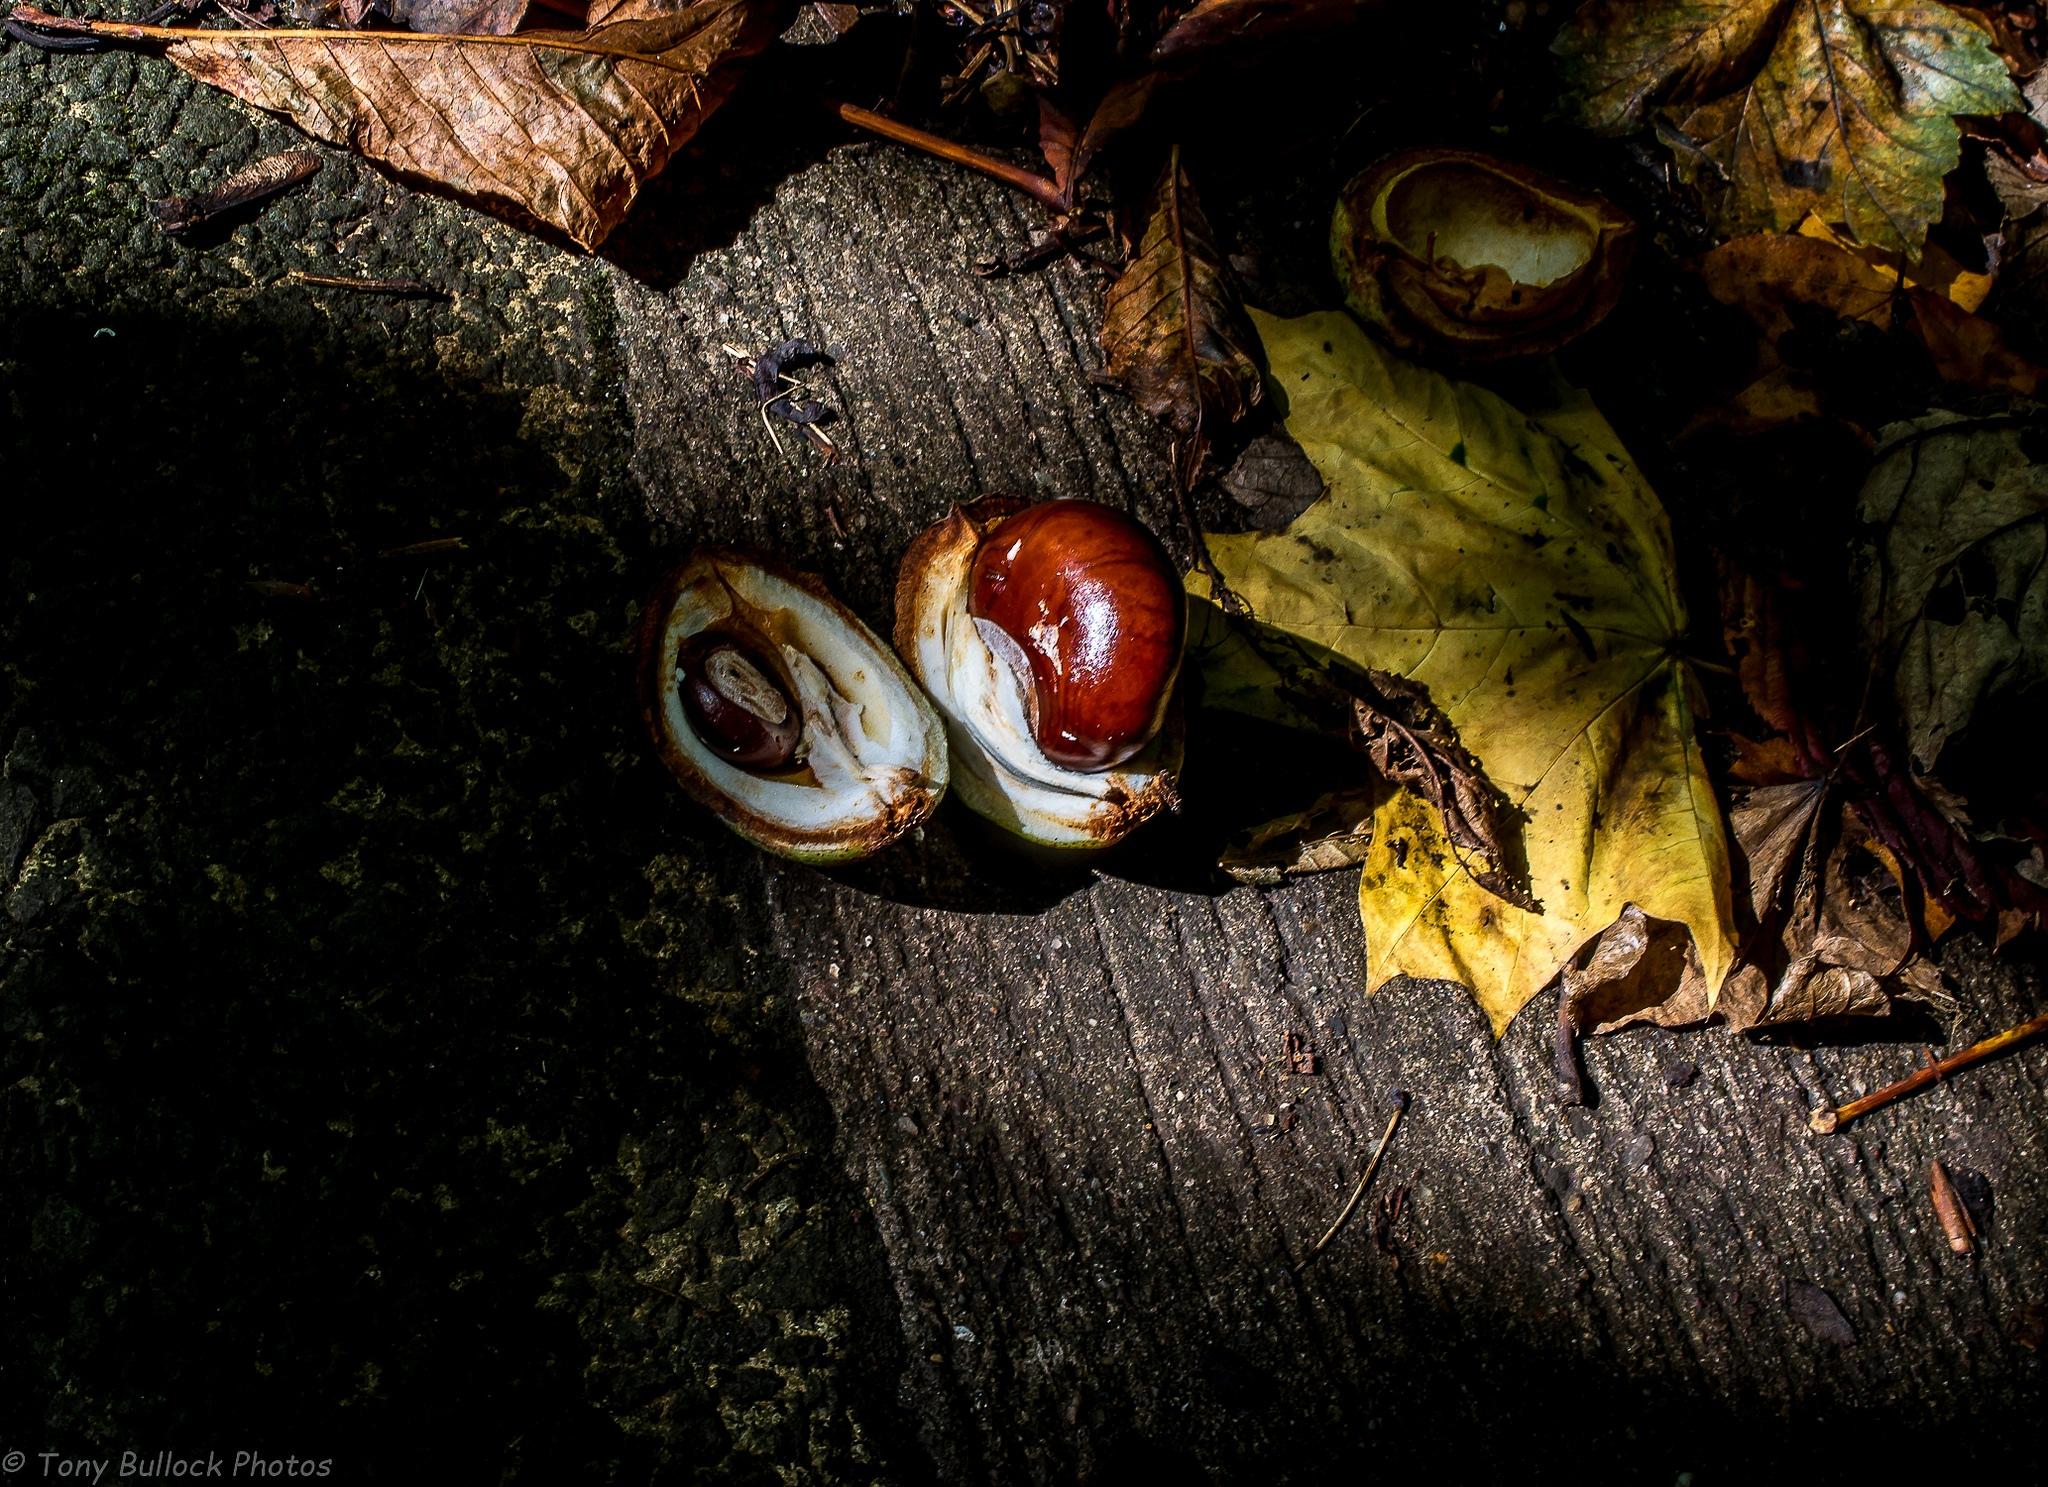 Untitled by TonyBphotos